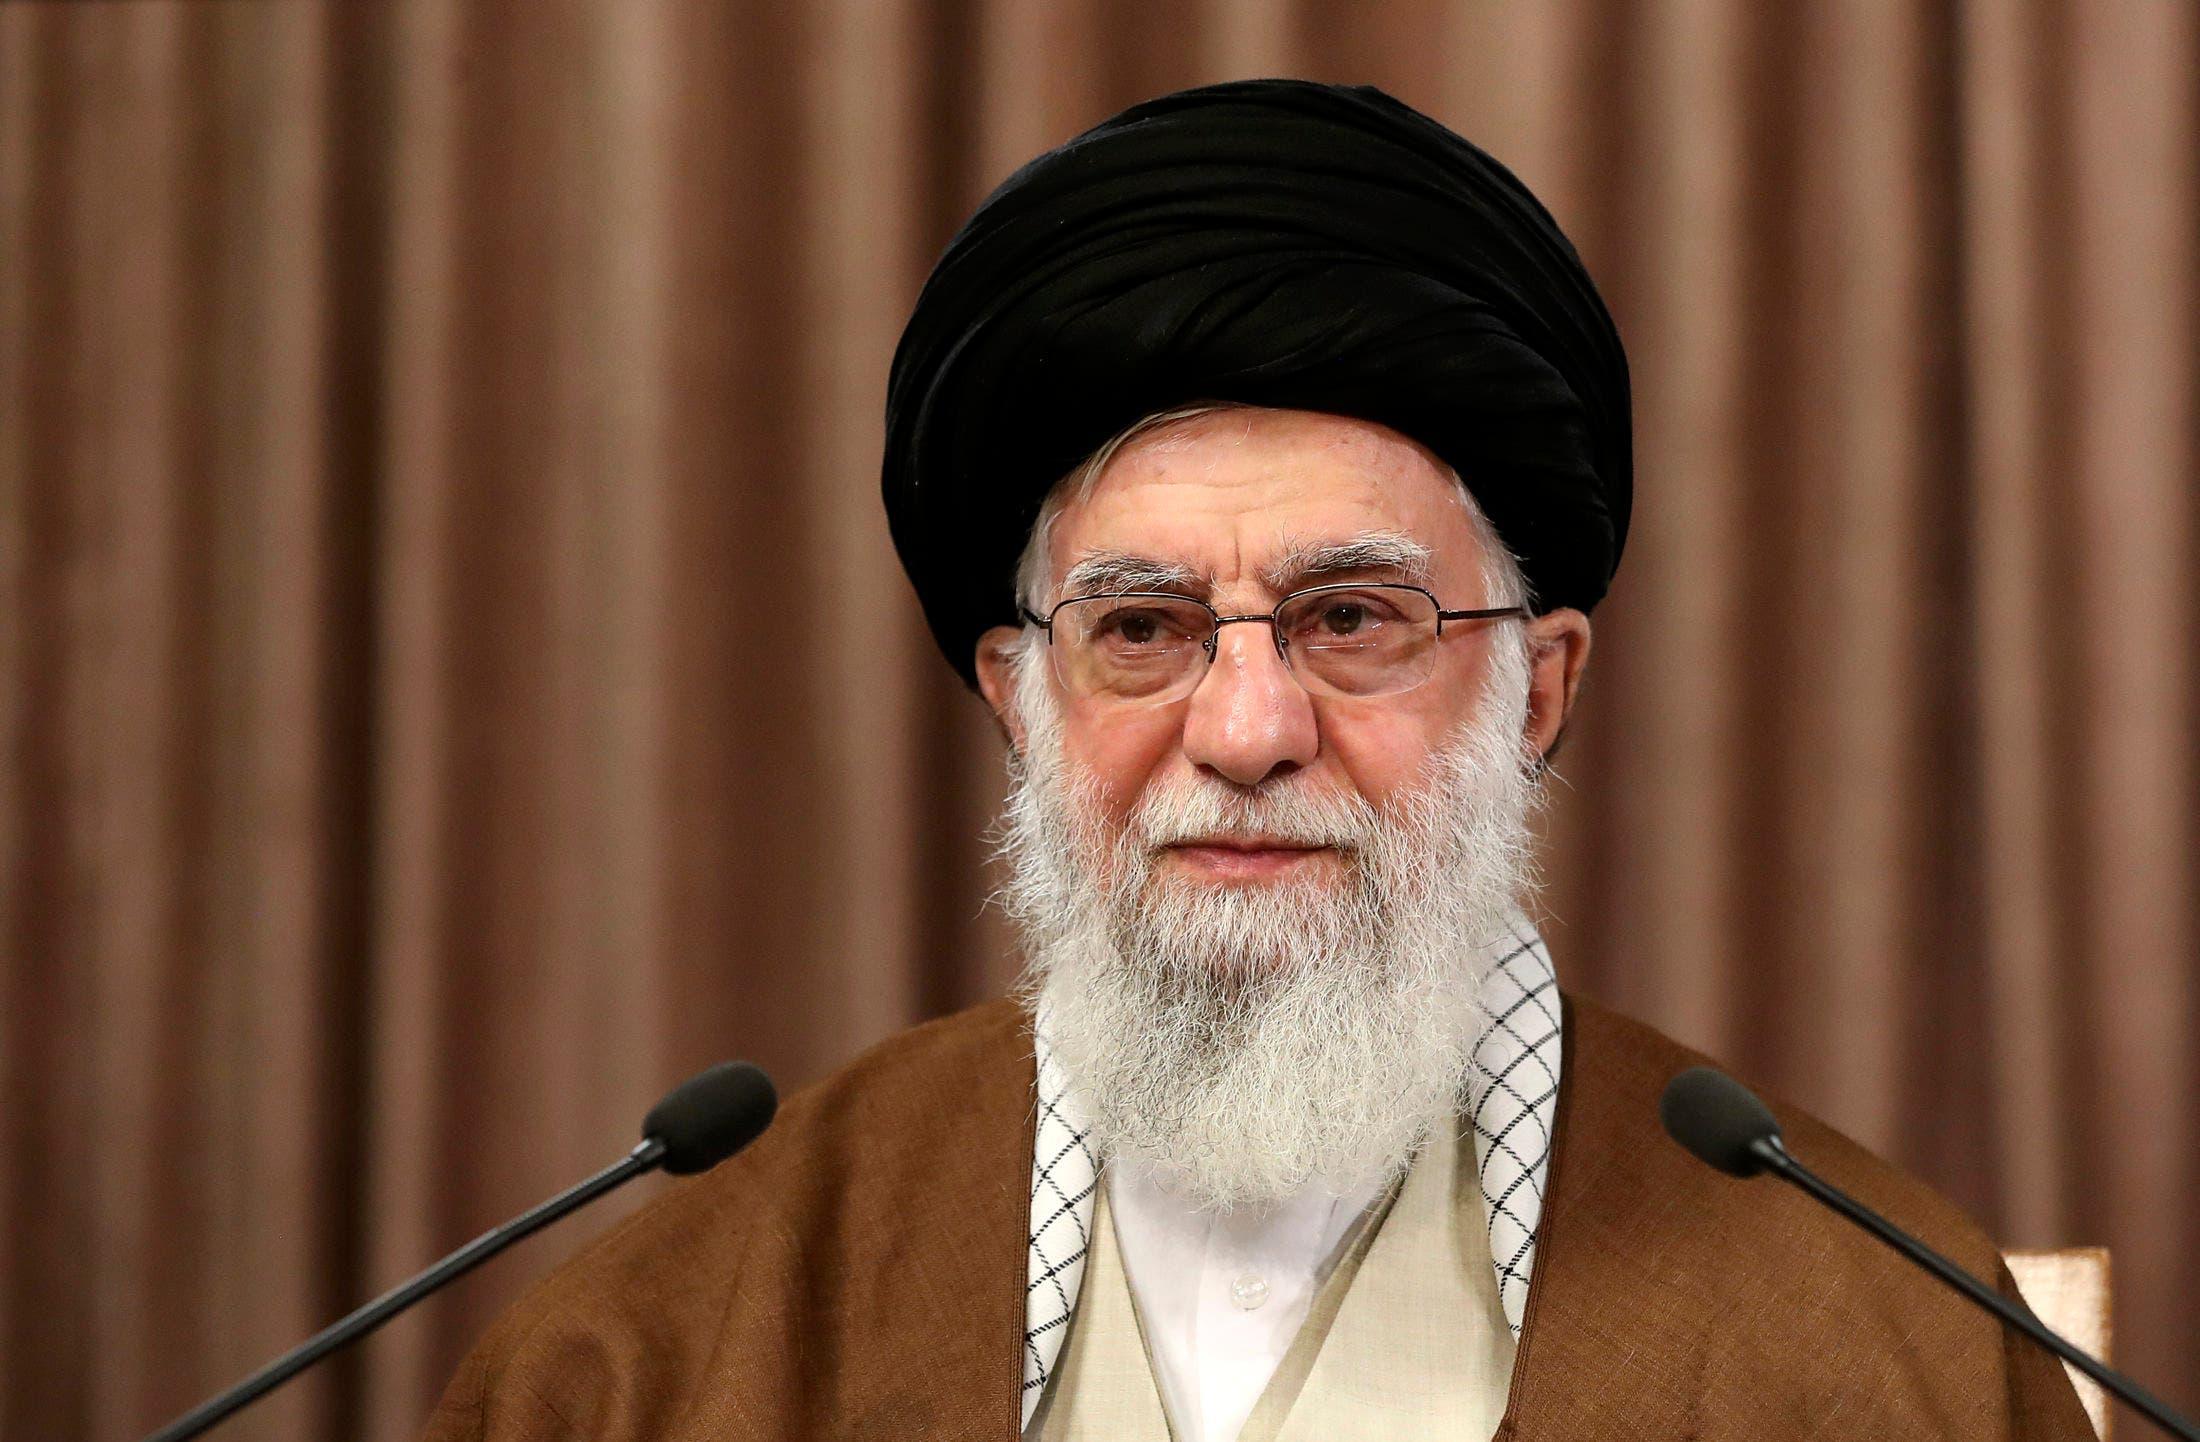 Iran S Khamenei Sees Himself As Savior To Arabs He Is Their Nightmare Al Arabiya English